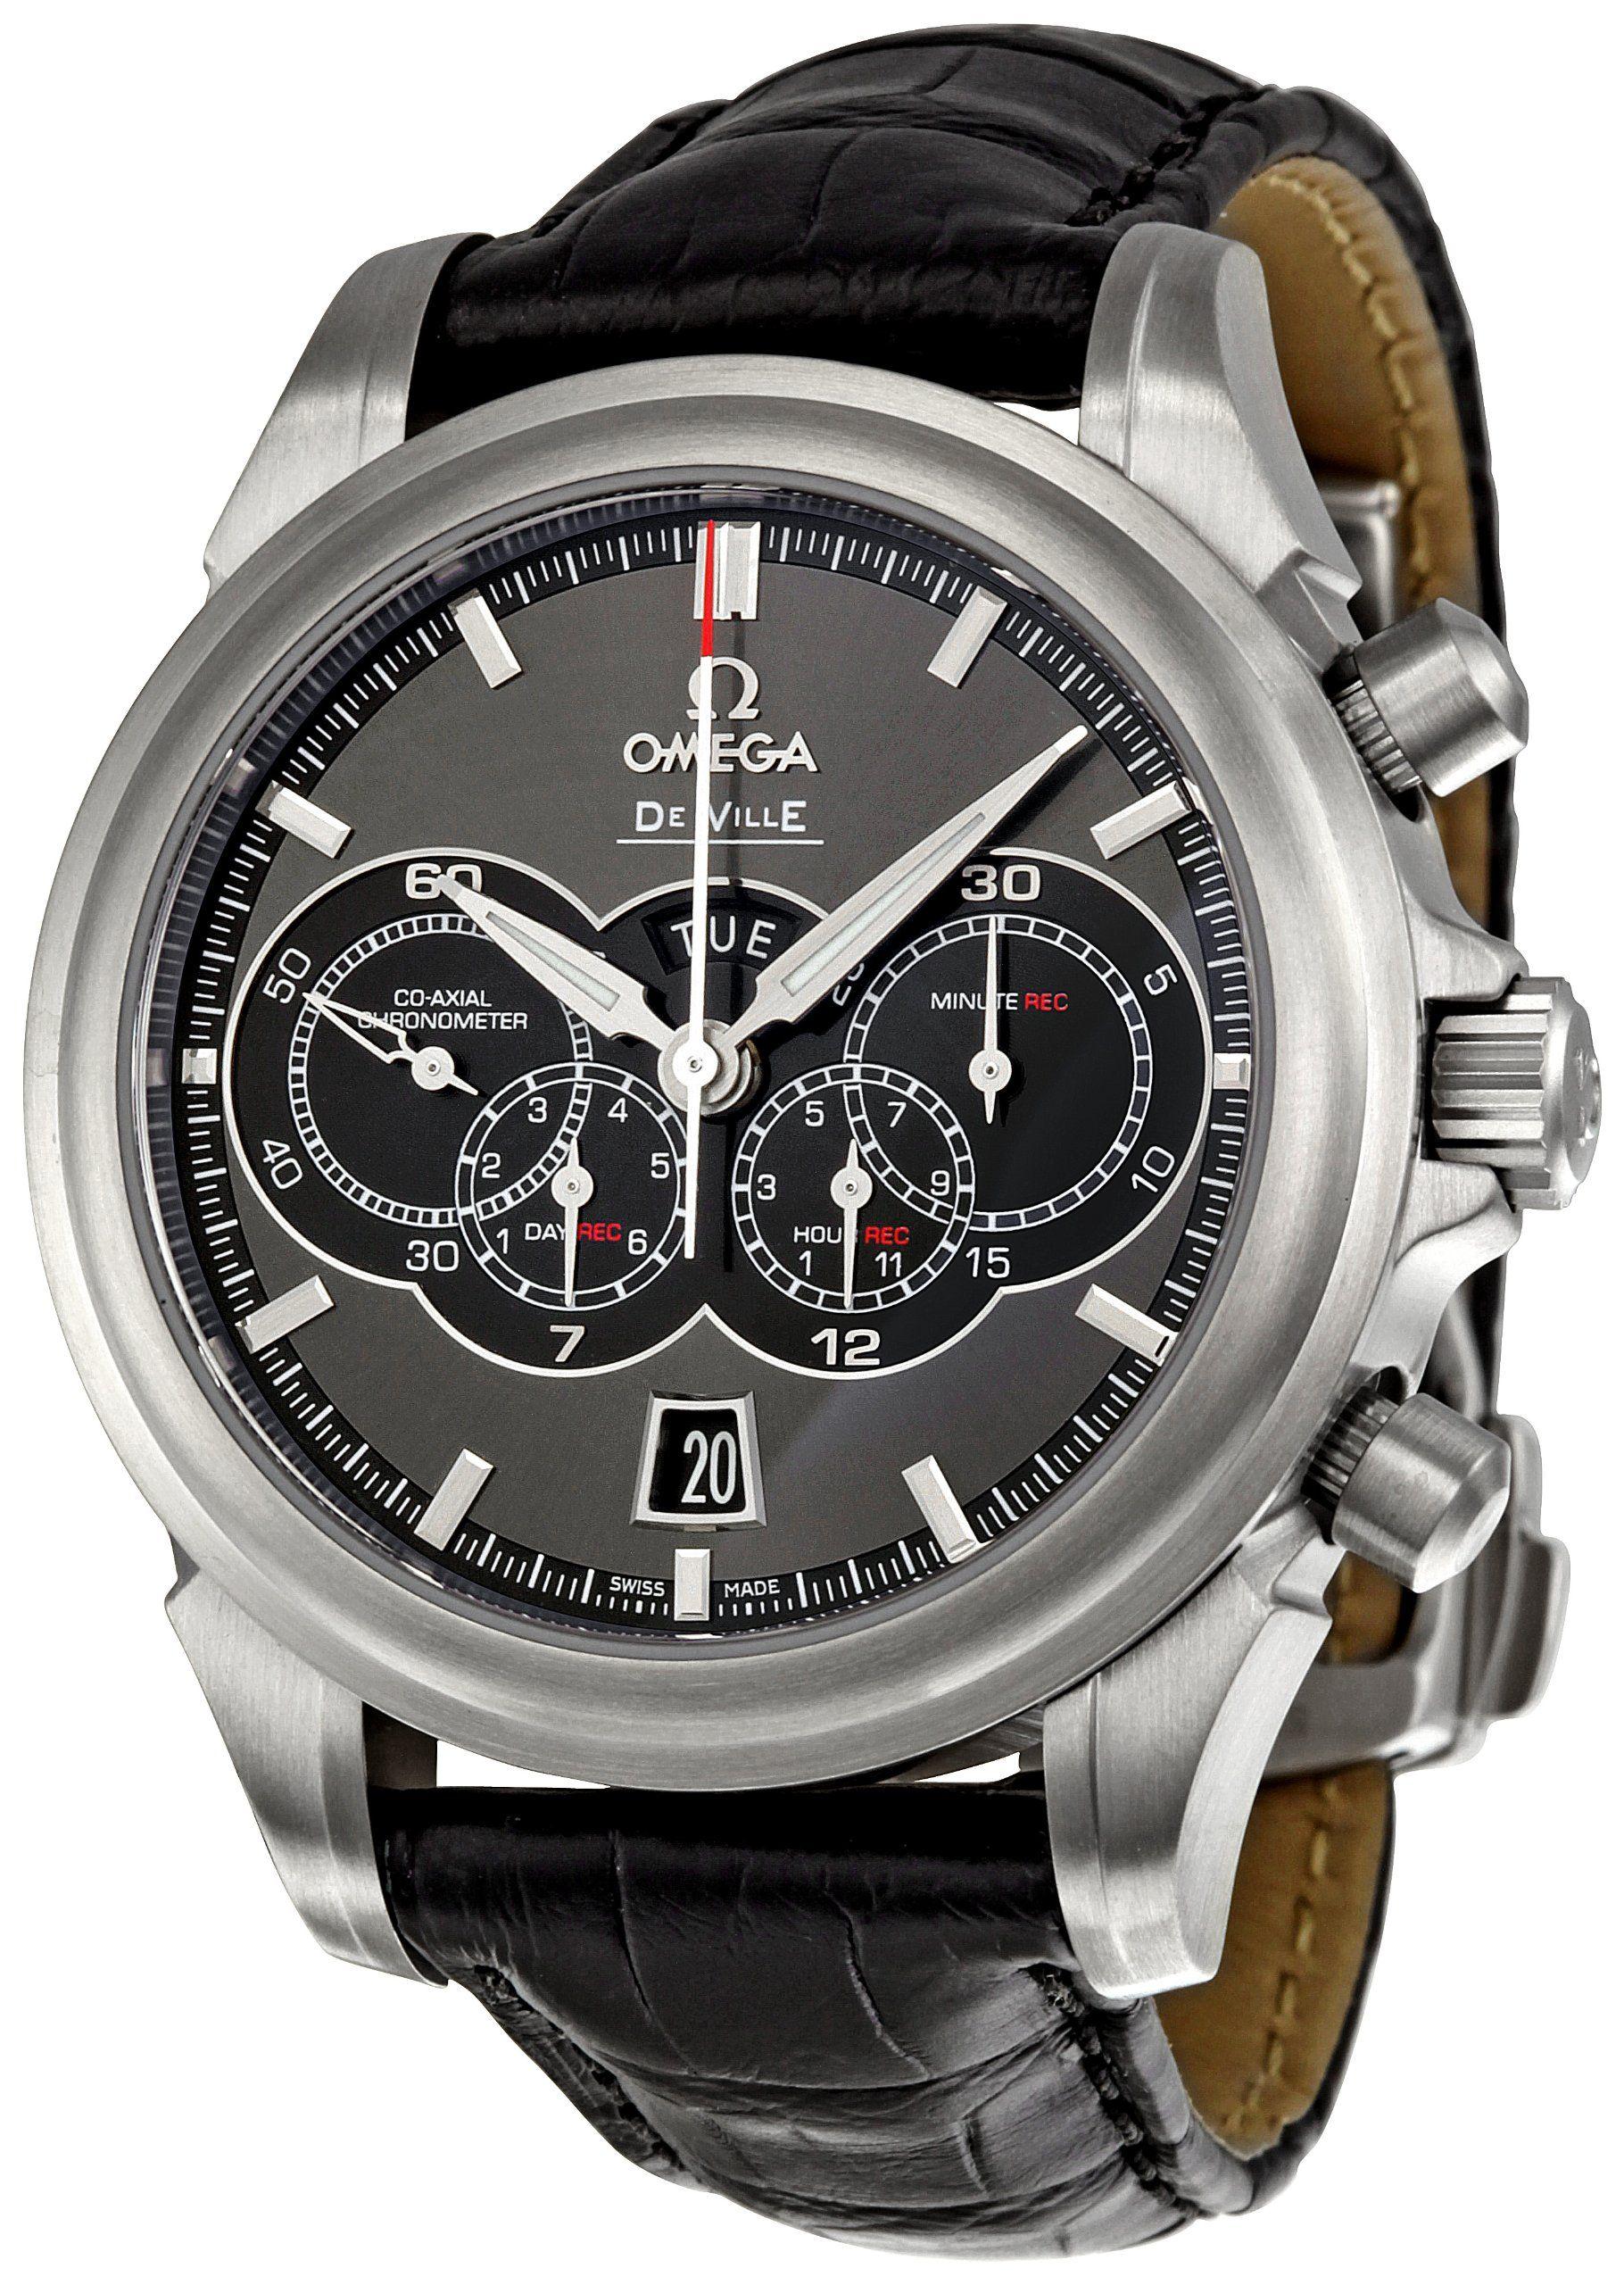 Omega Men s 422 13 41 52 06 001 DeVille Chronograph Watch